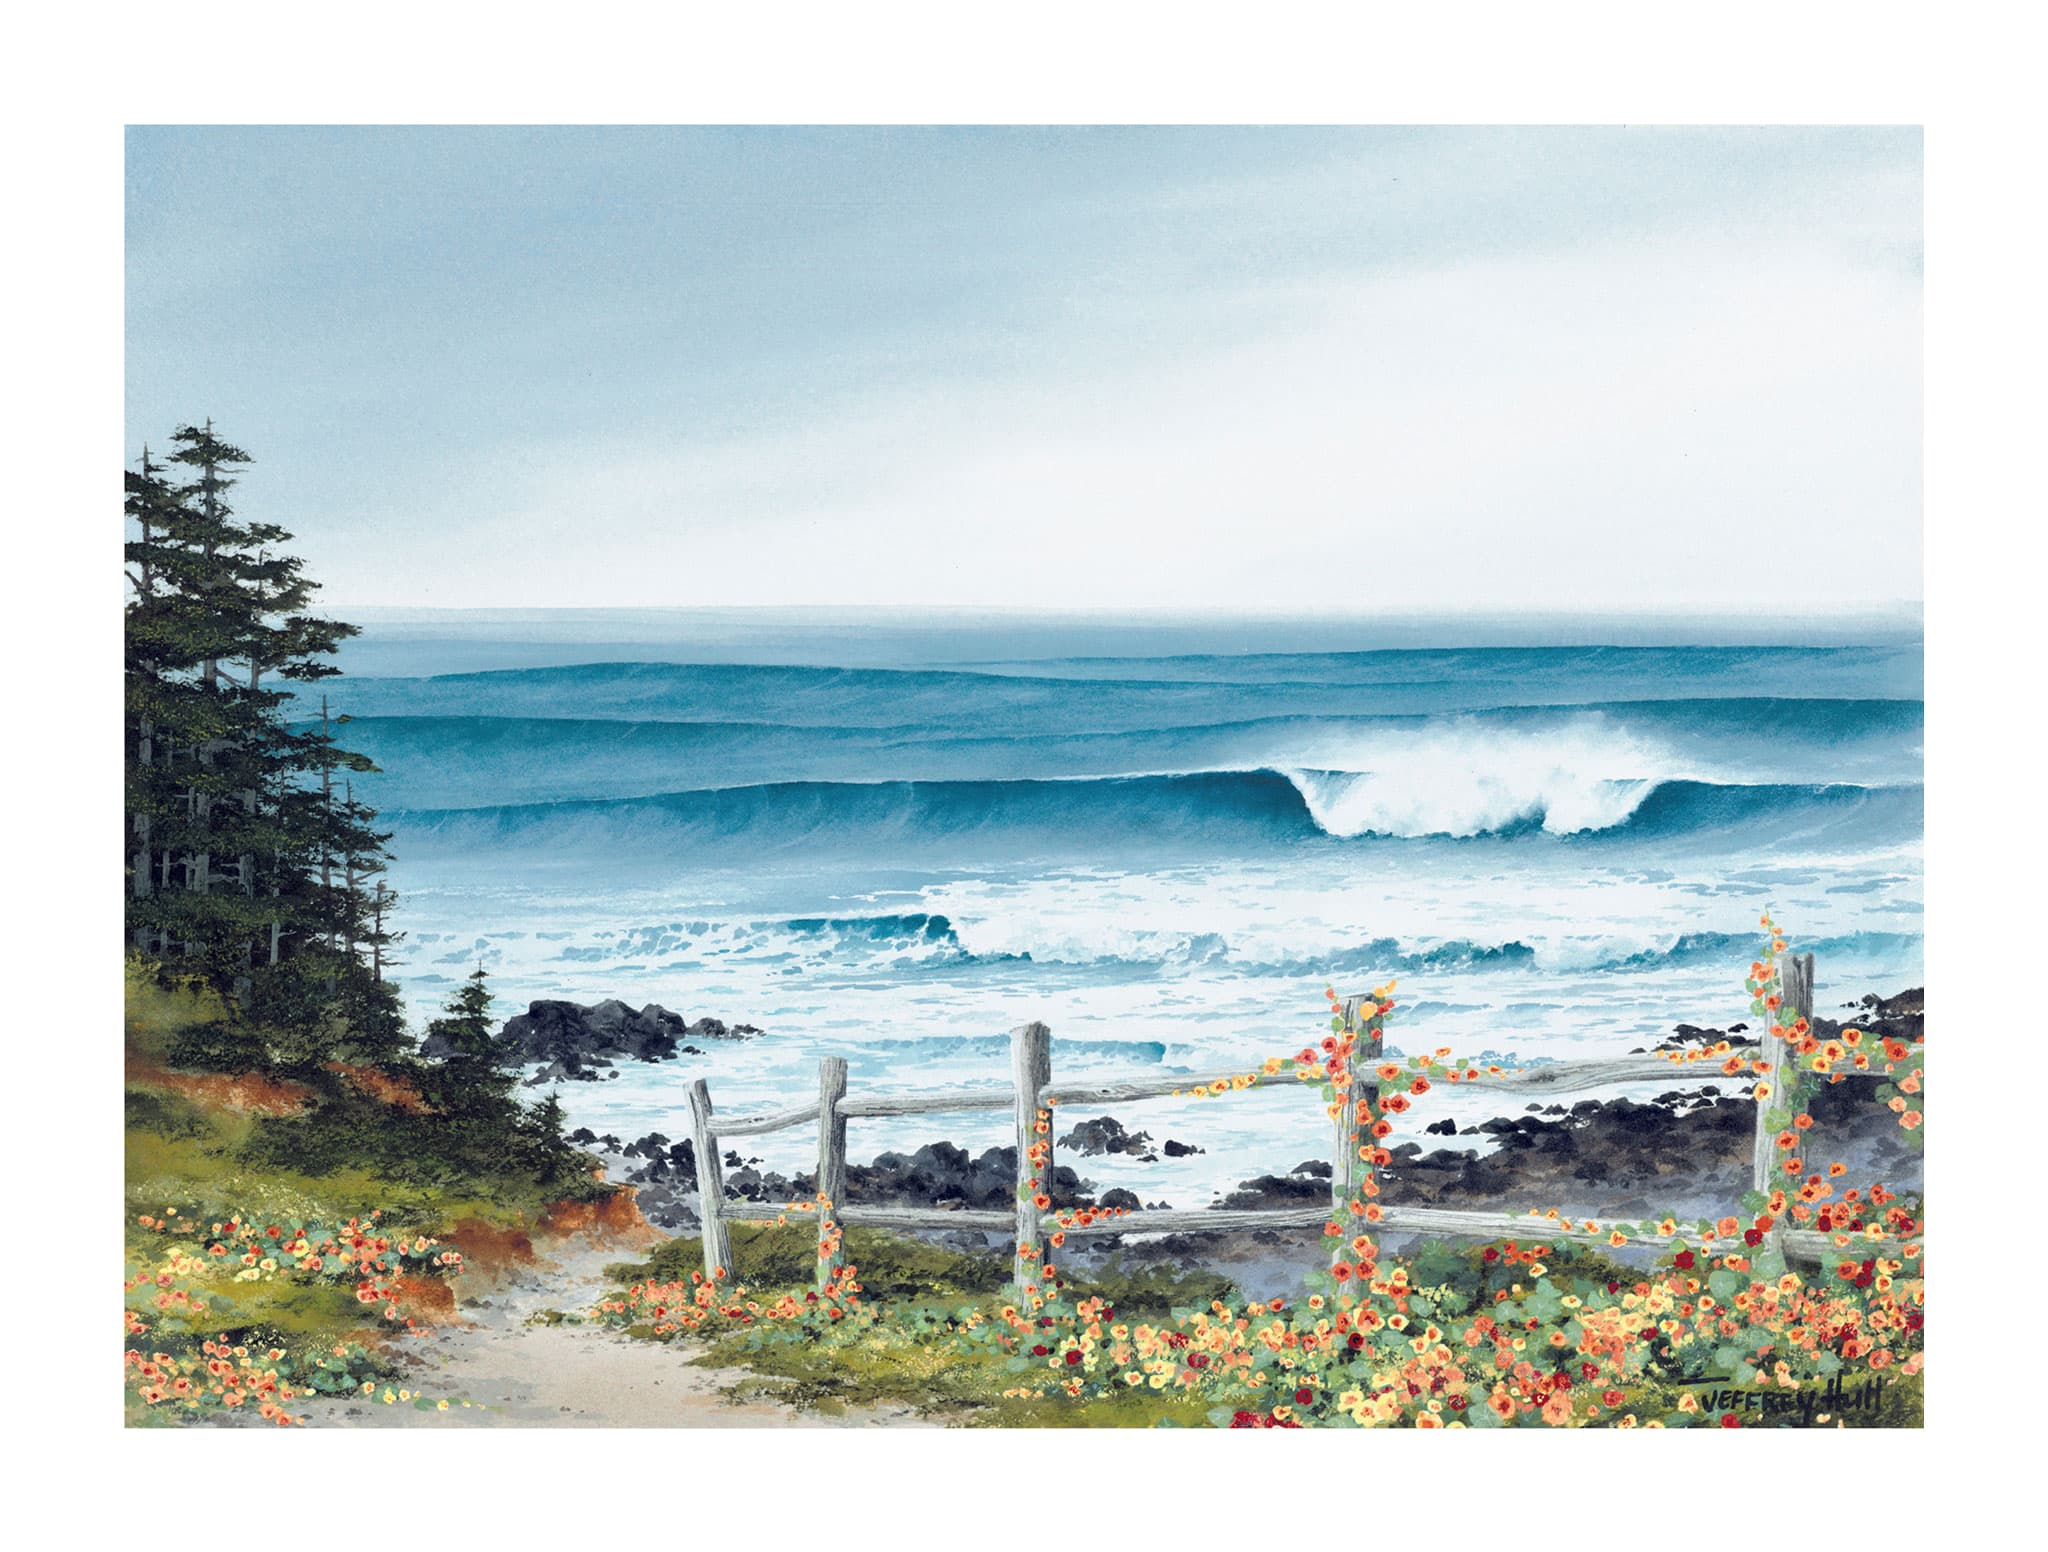 Summer-Magic-OpenEd-Unframed-4-Website-2021